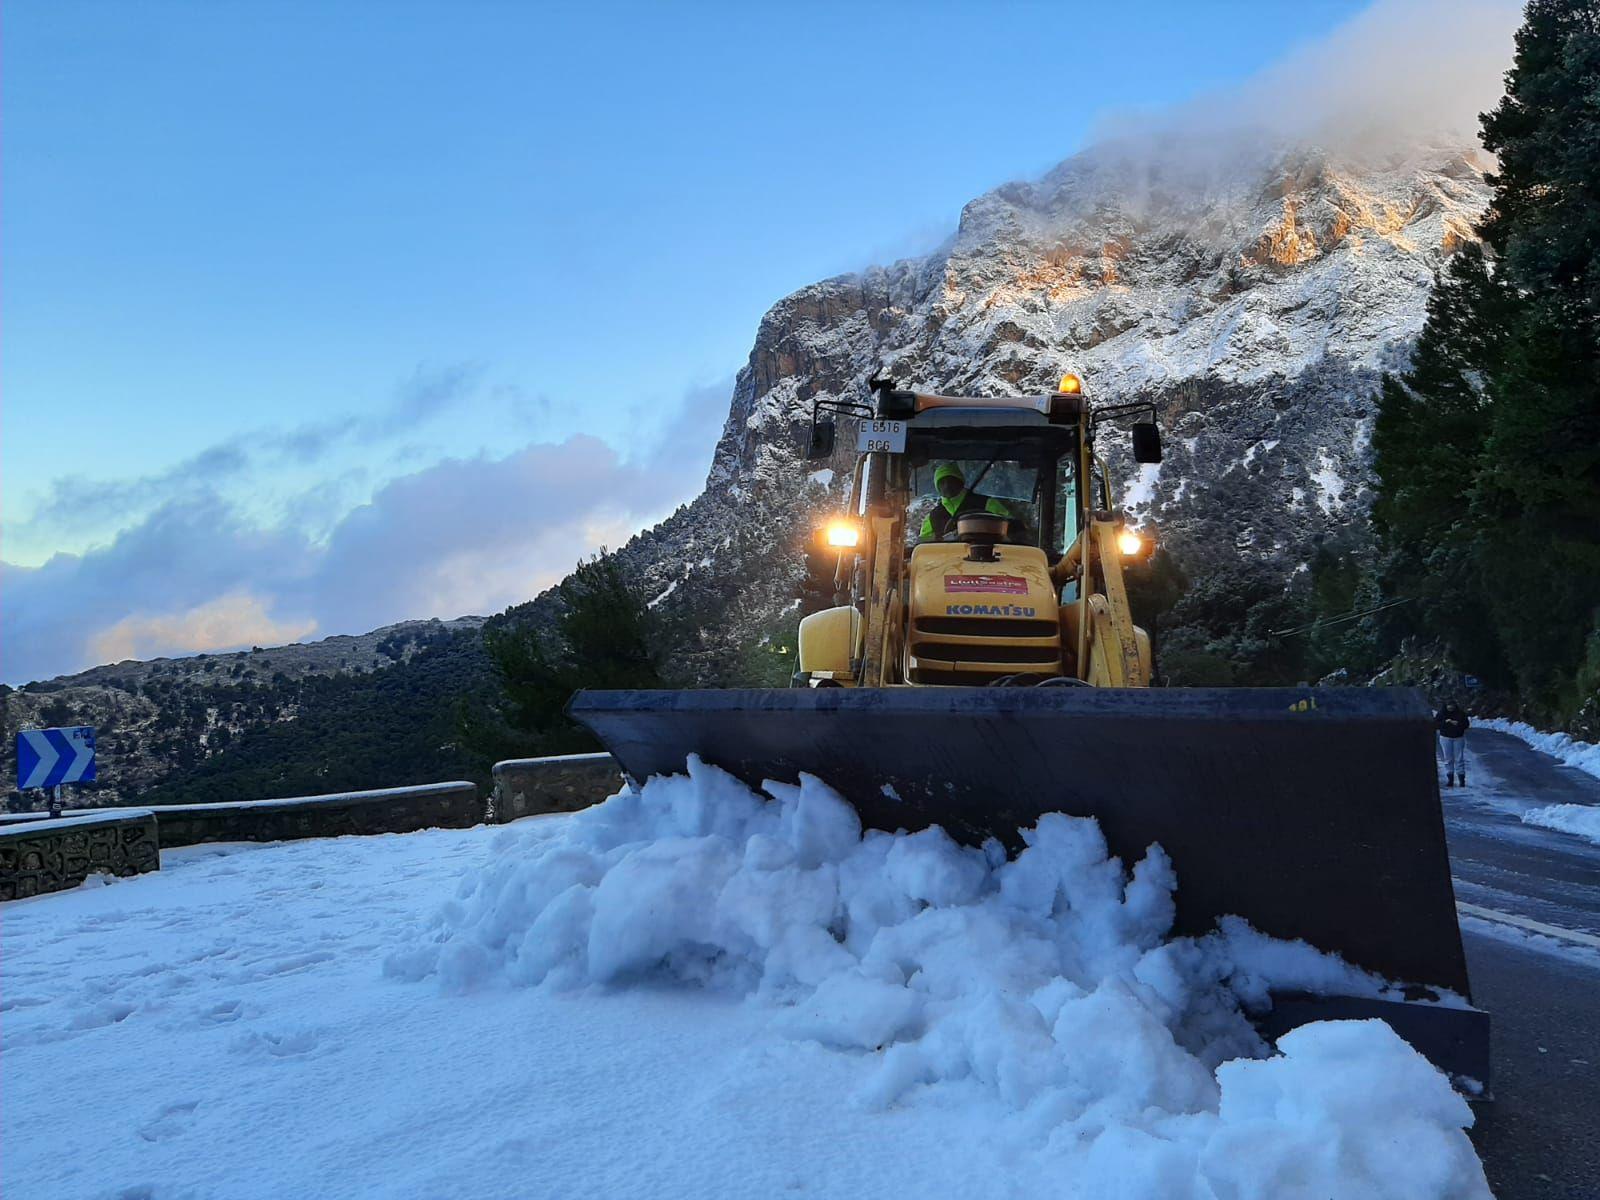 Nieve en la serra de Tramuntana